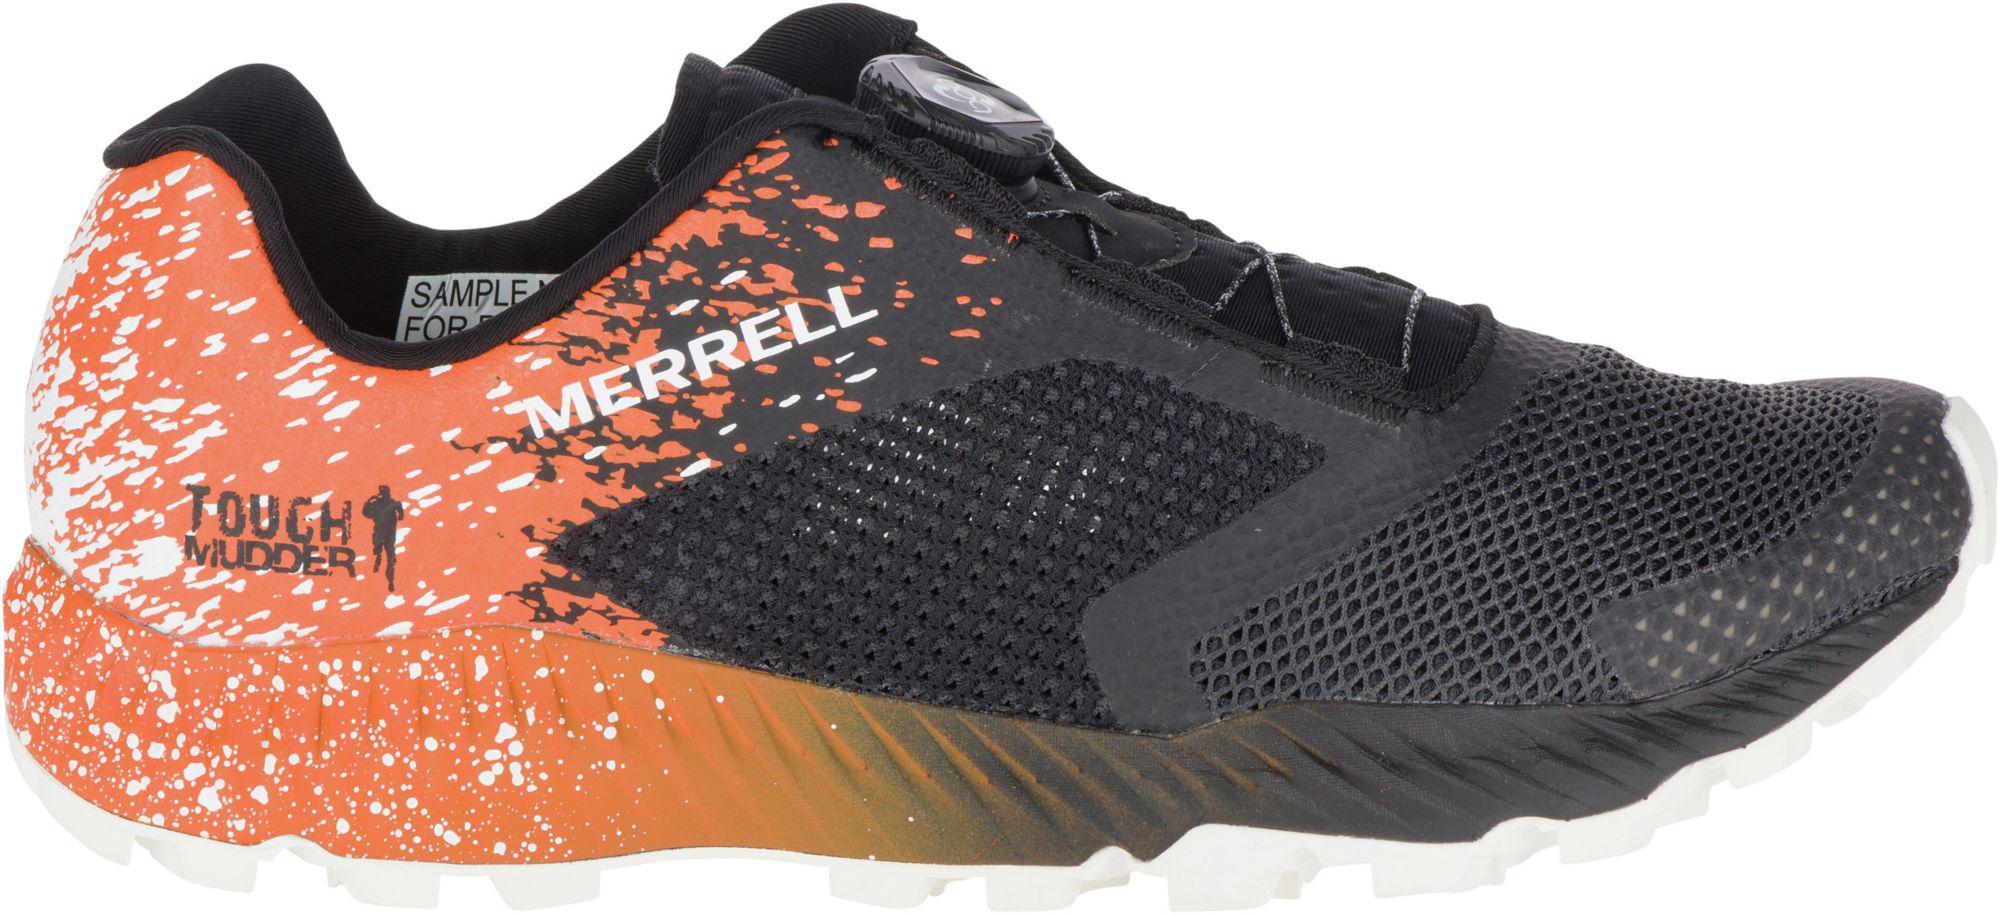 dec6f9bdfac Merrell - Orange All Out Crush 2 Tough Mudder Boa Trail Running Shoes for  Men -. View fullscreen